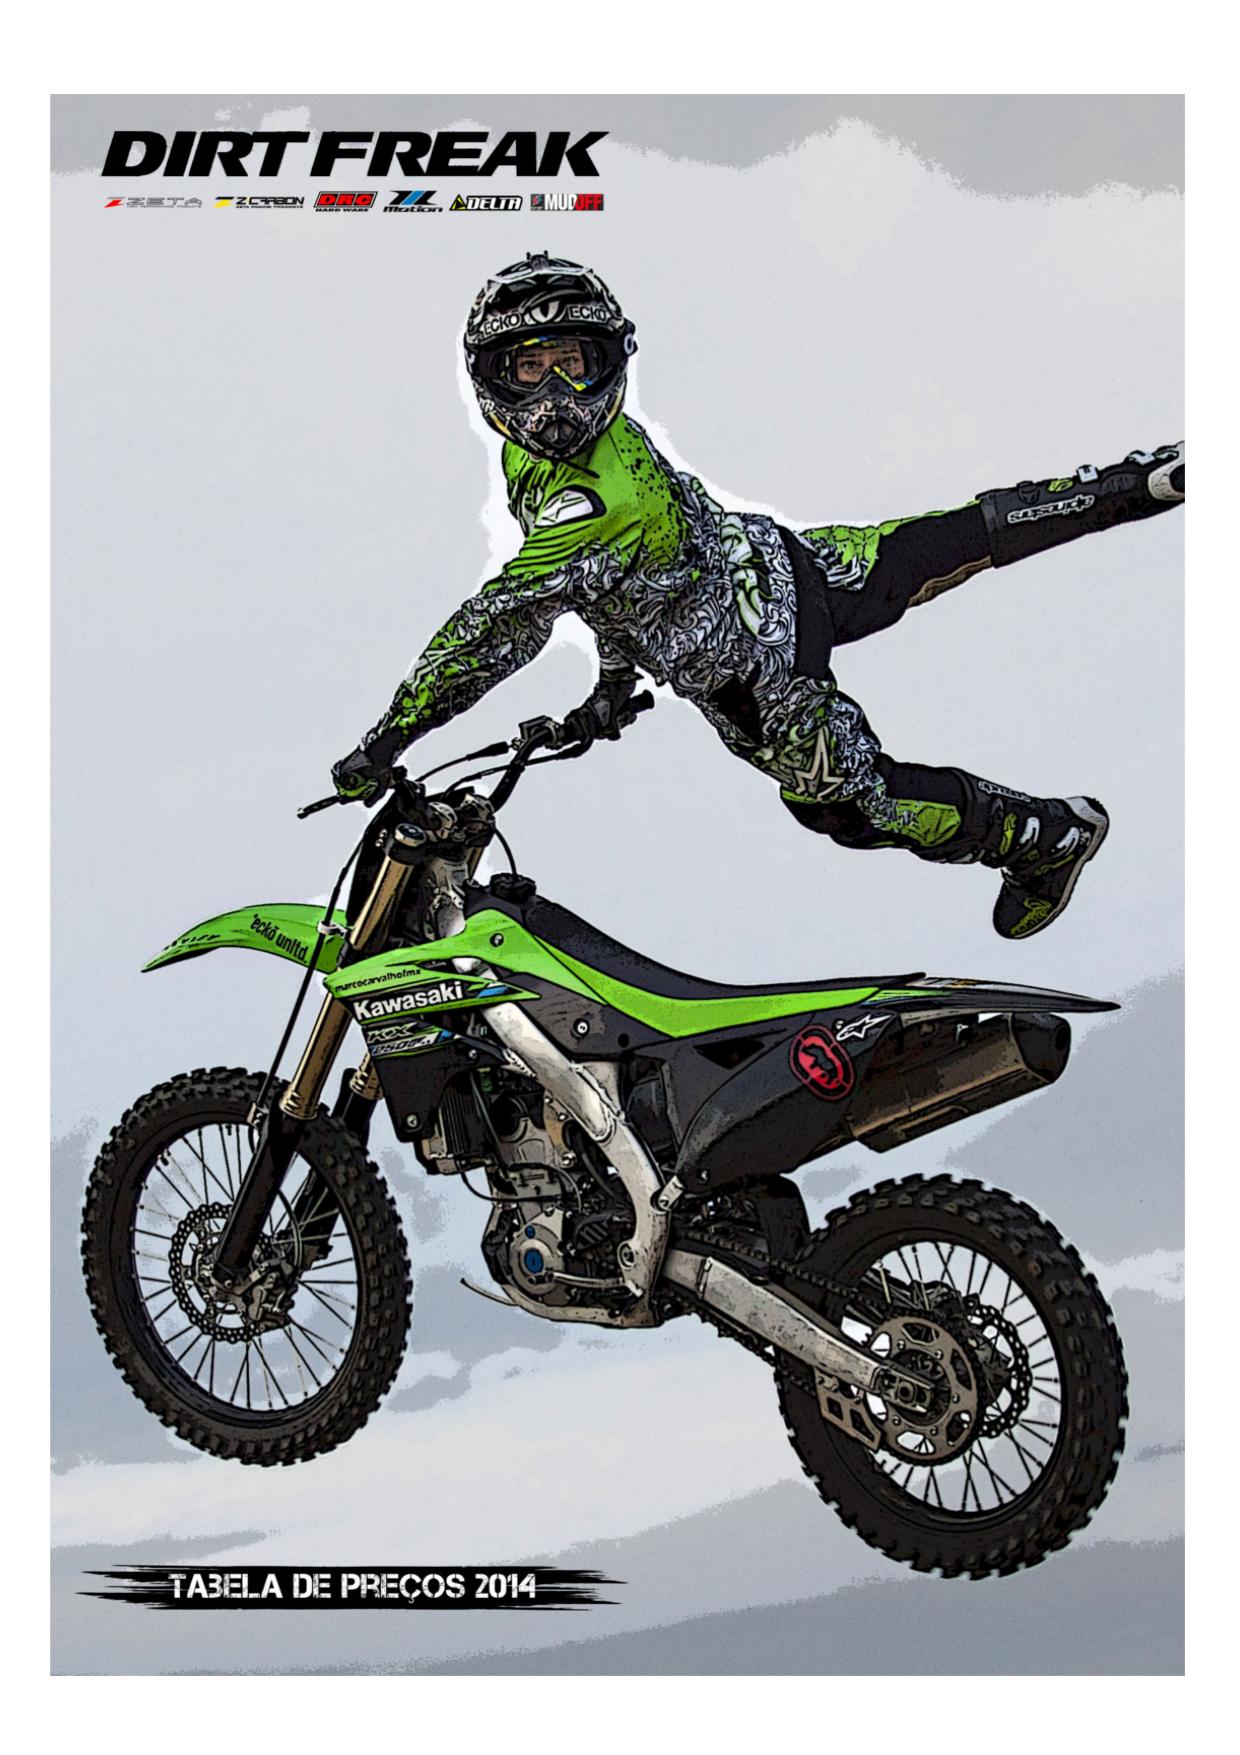 Motorcycle M8 6Pcs Universal Rear Sprocket Bolts Screw For HONDA YAMAHA KTM SUZUKI KAWASAKI CRF CR YZ YZF WR WRF SX EXC XC SXF XCF EXCF XCW RMZ DR RM KX KXF KLX FE FC TE TC 125 250 350 450 Dirt Bike